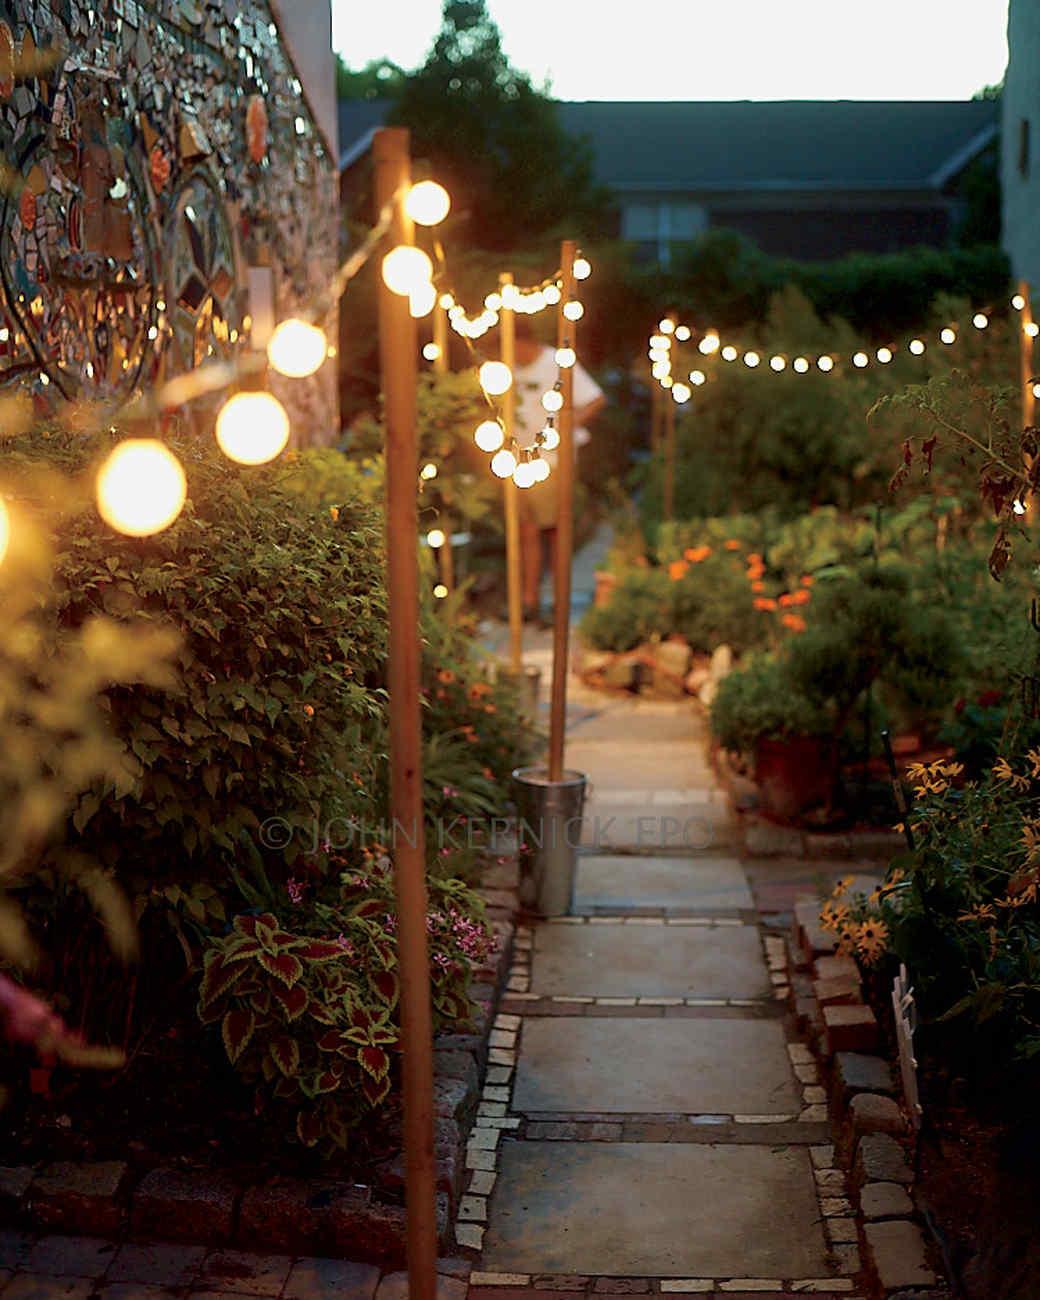 This Community Garden Potluck Party Will Inspire You | Martha Stewart